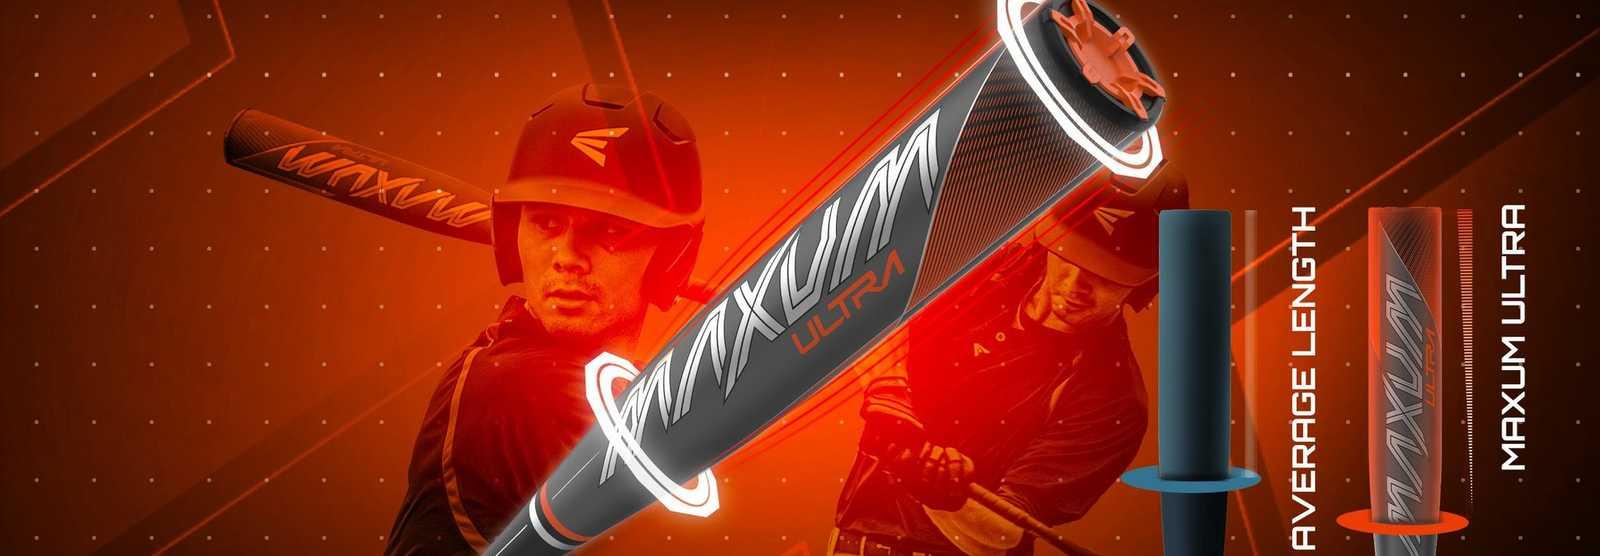 maxum-ultra-bbcor-baseball-bat